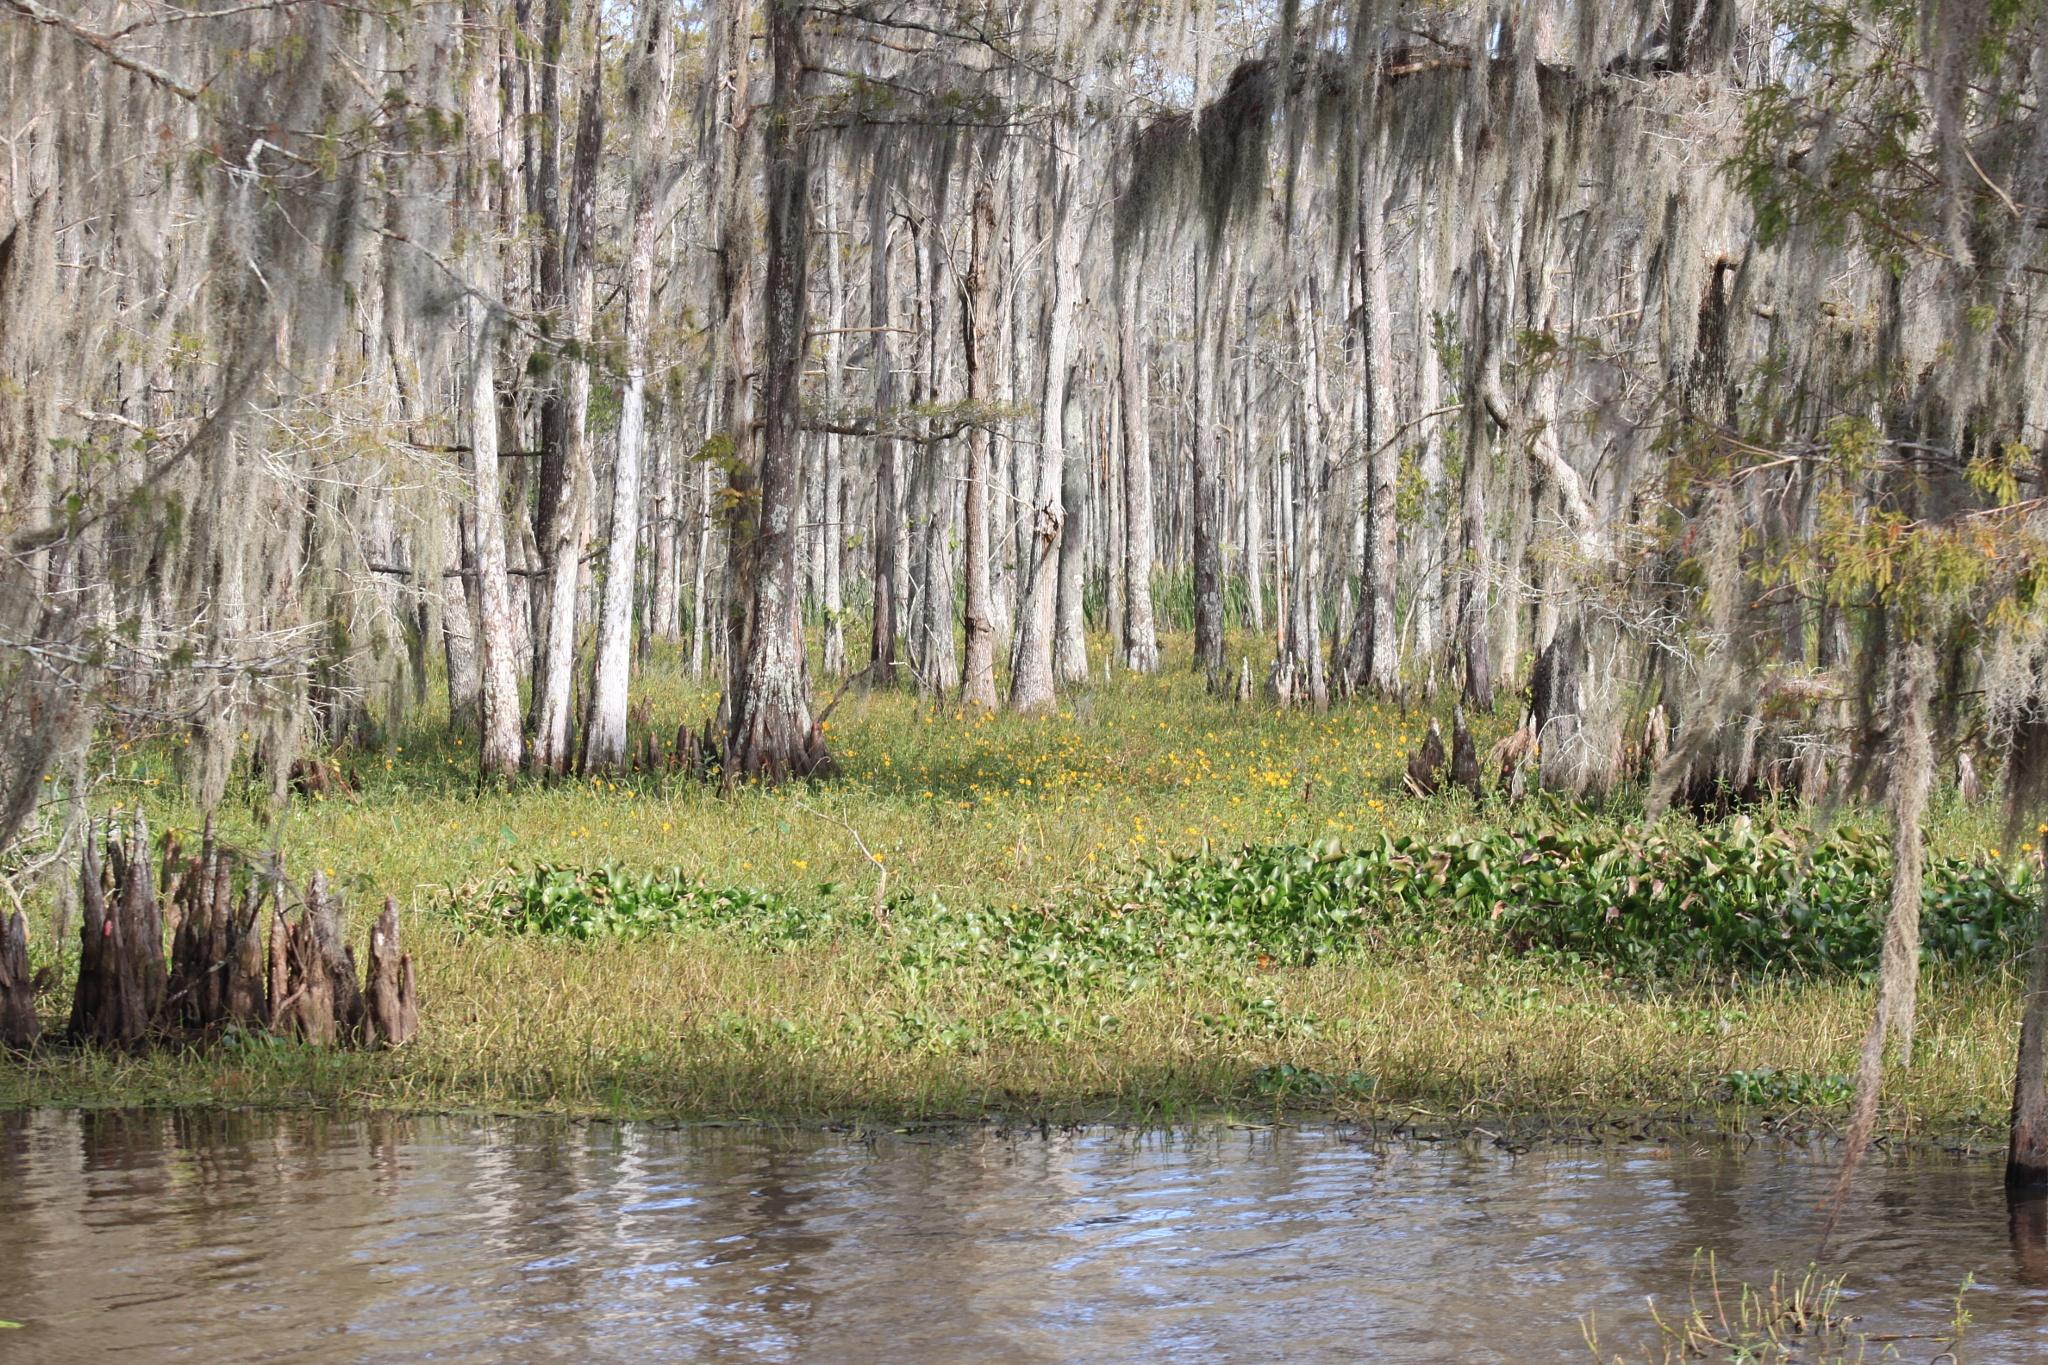 Louisiana Cypress Swamp by kajunmedic